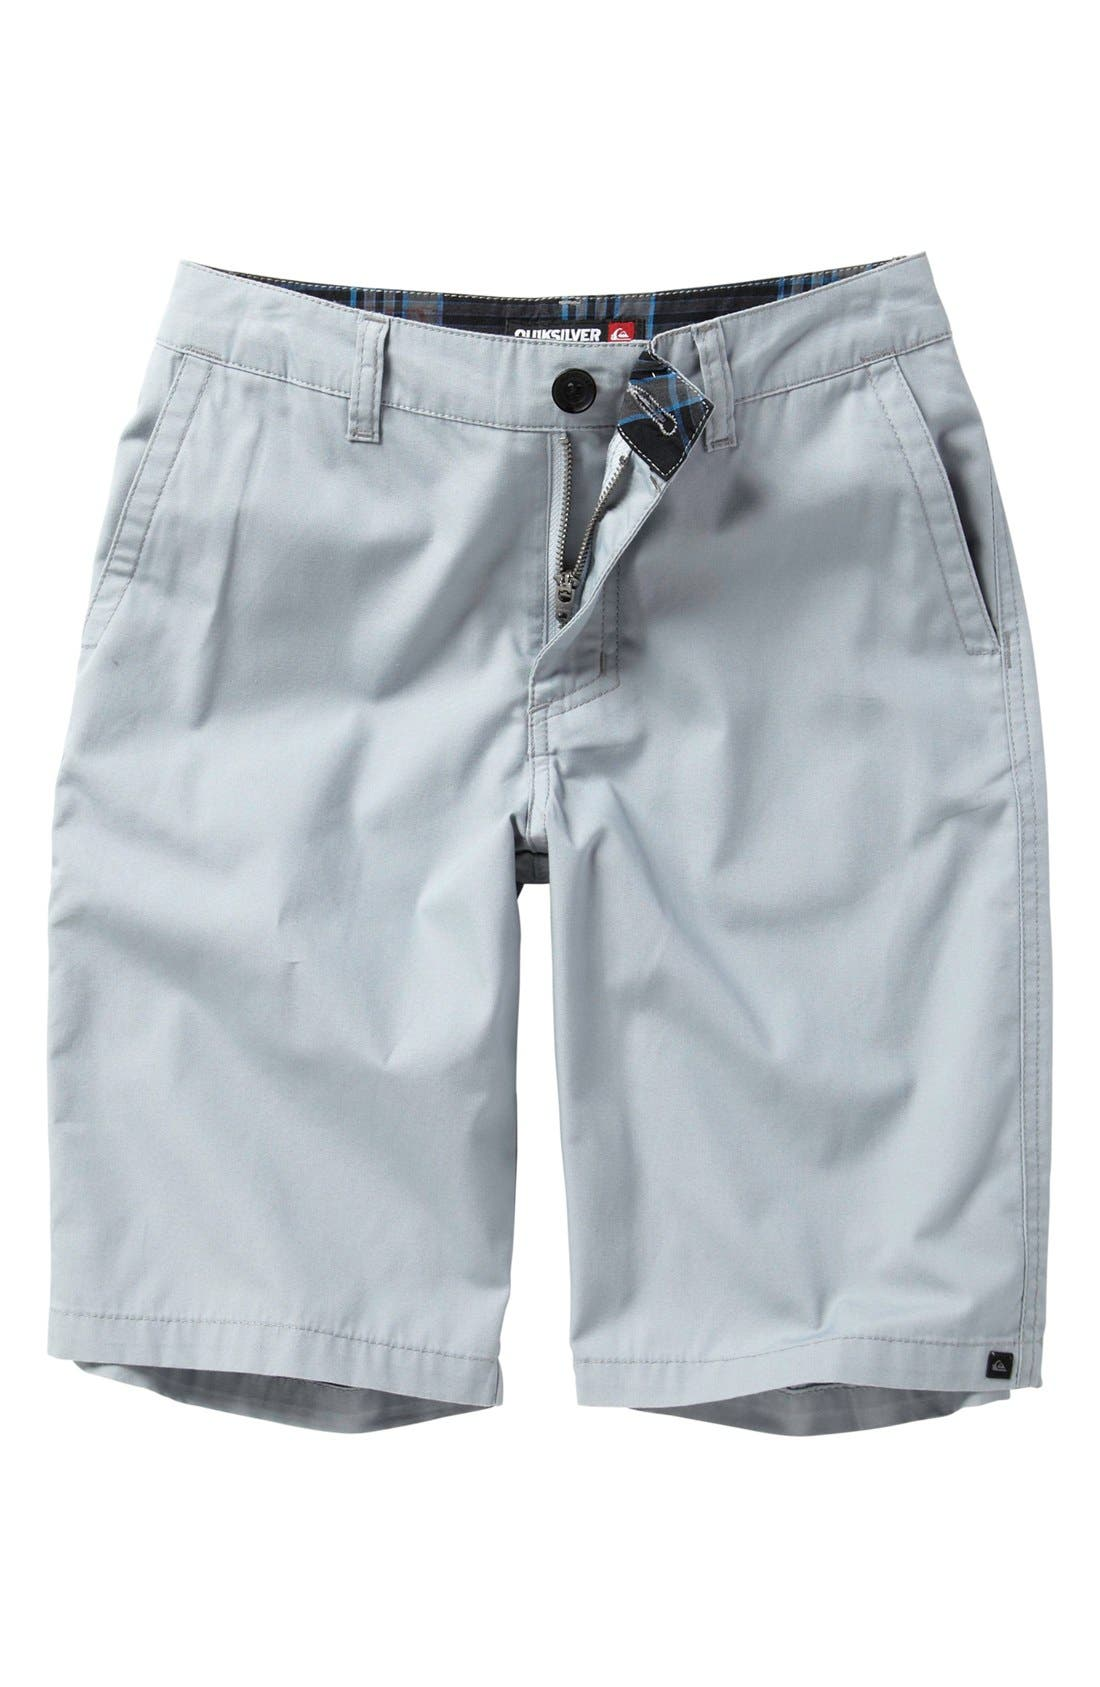 Alternate Image 1 Selected - Quiksilver 'Rockefeller' Shorts (Big Boys)